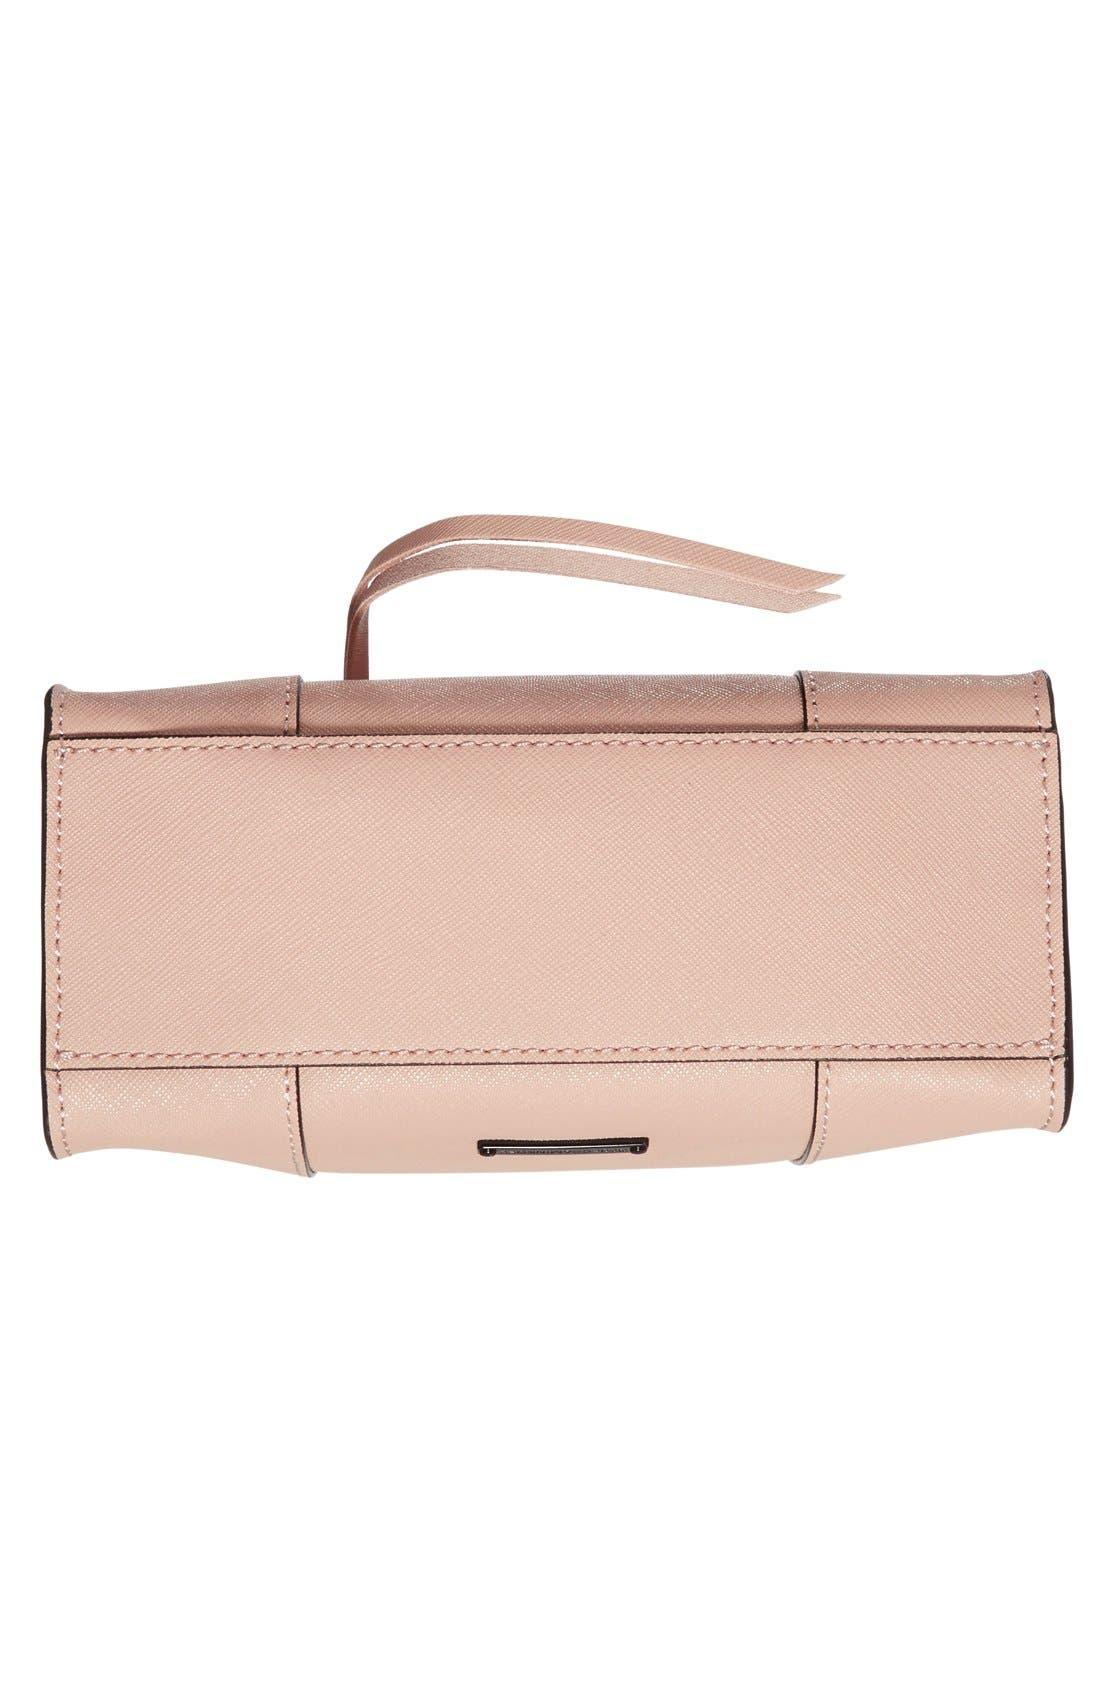 ,                             'Mini MAB Tote' Crossbody Bag,                             Alternate thumbnail 50, color,                             252